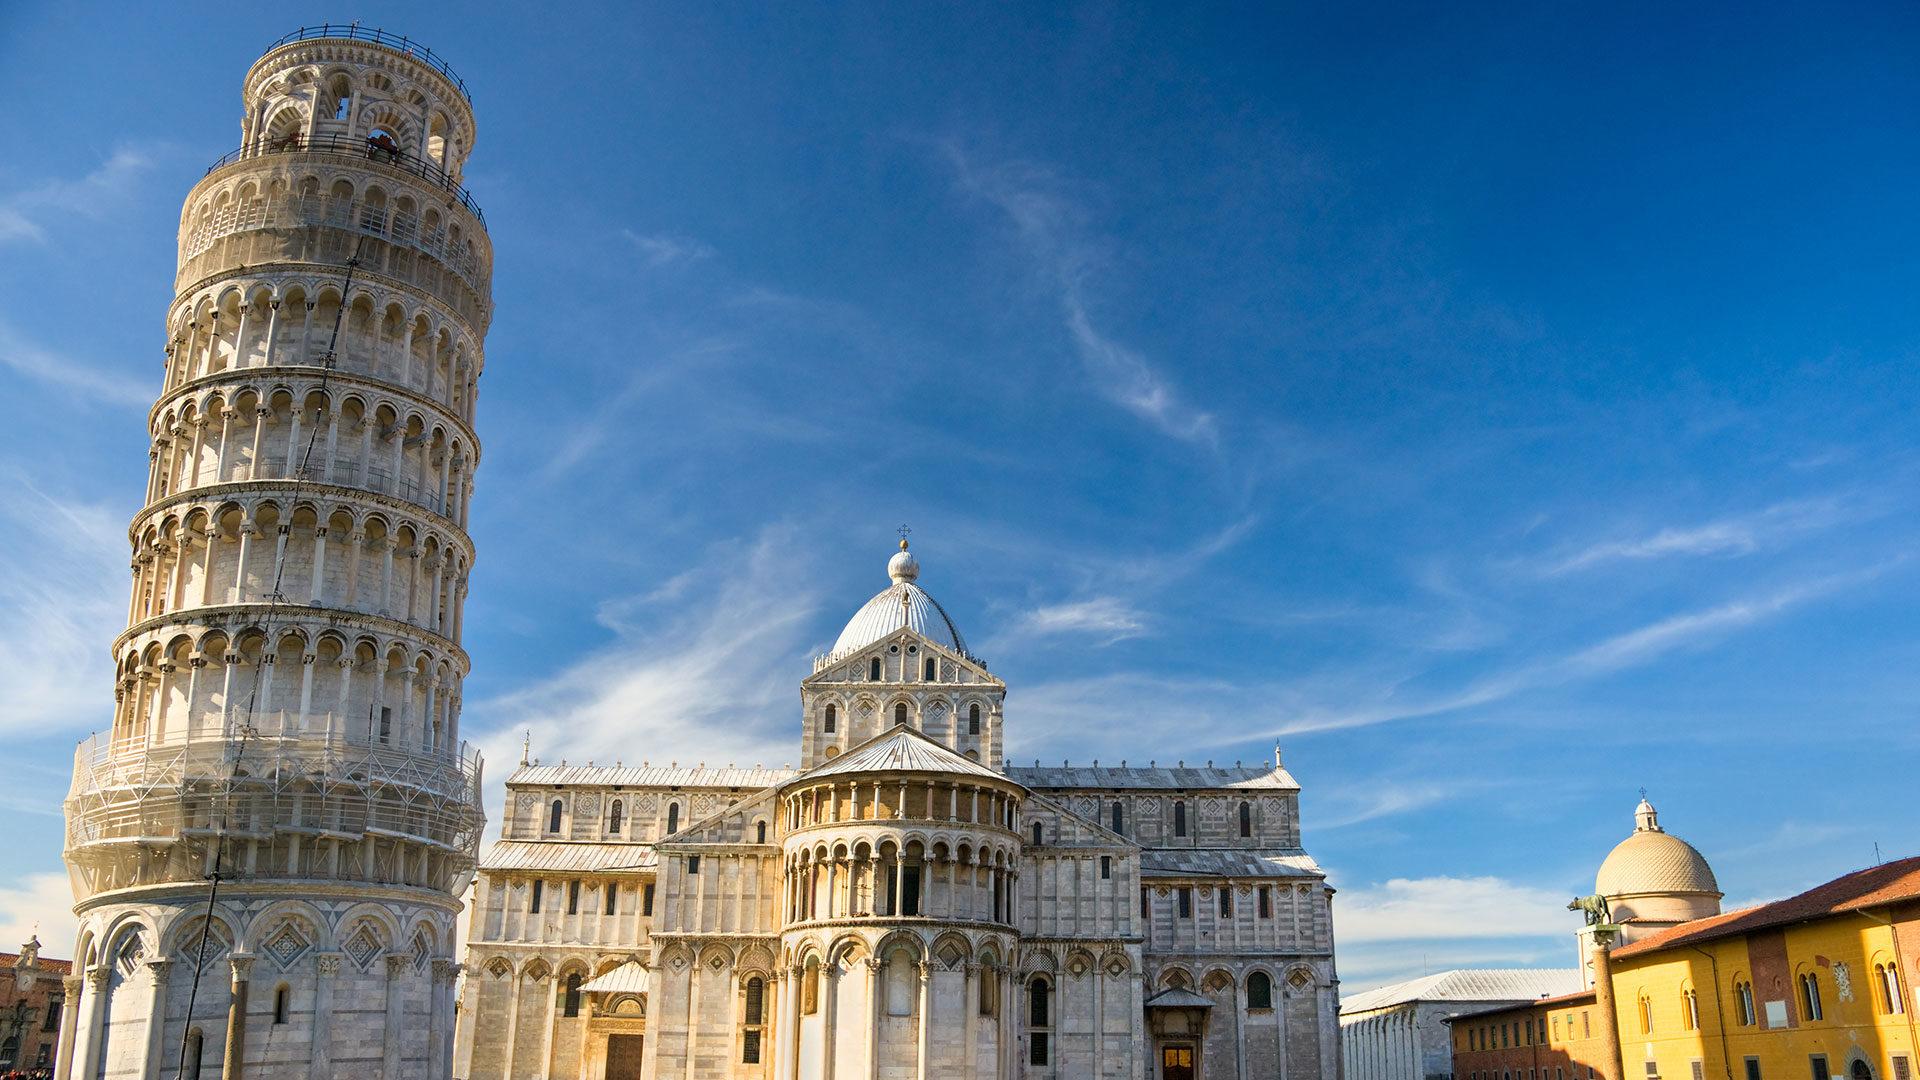 Torre Pisa 1920x1080 - Tour dai 3 porti